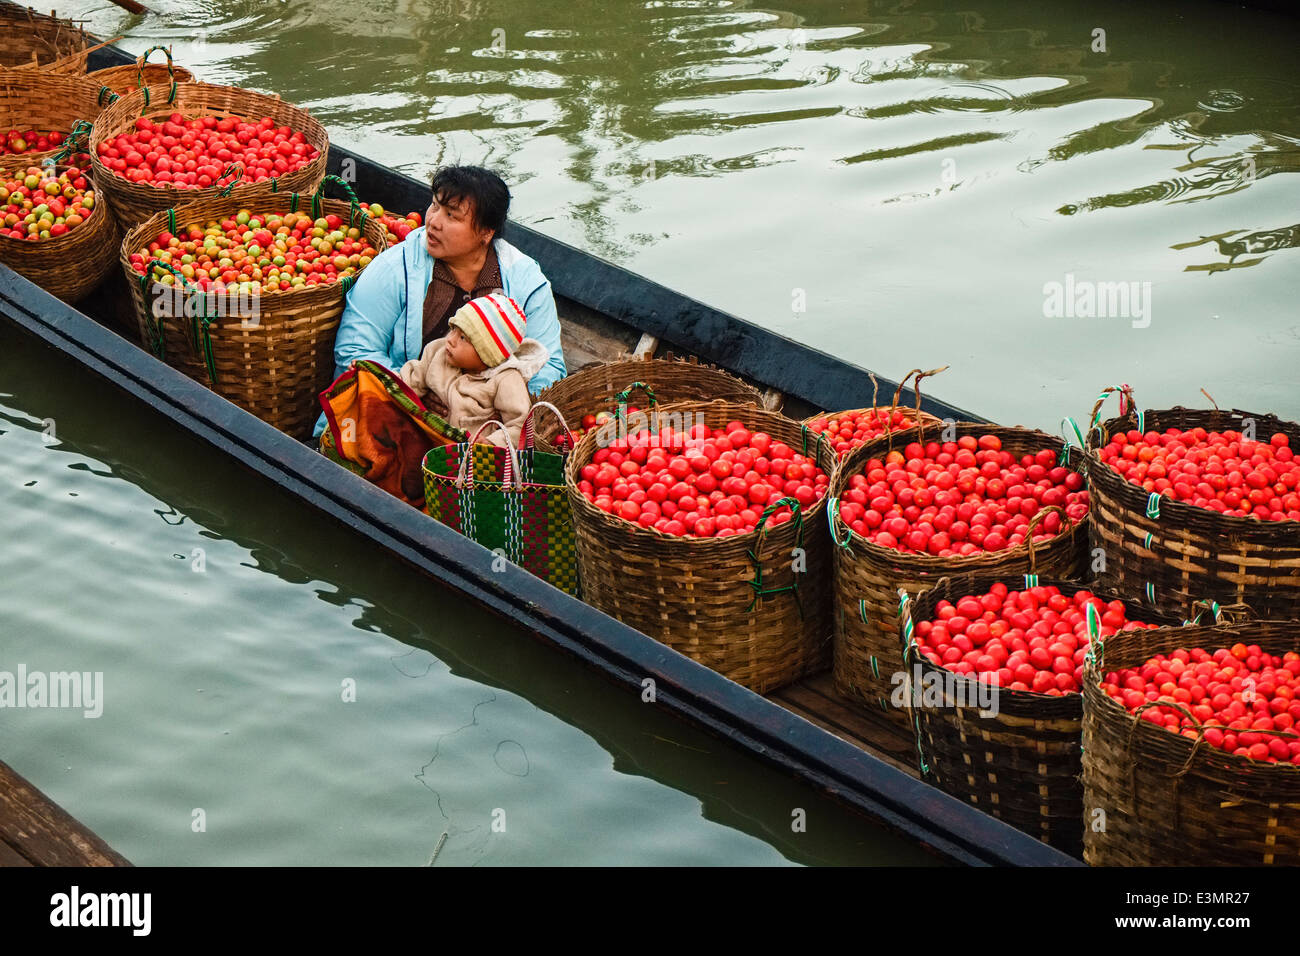 Farmers unload tomatoes, Nyaung Shwe, Inle Lake, Myanmar, Asia Stock Photo